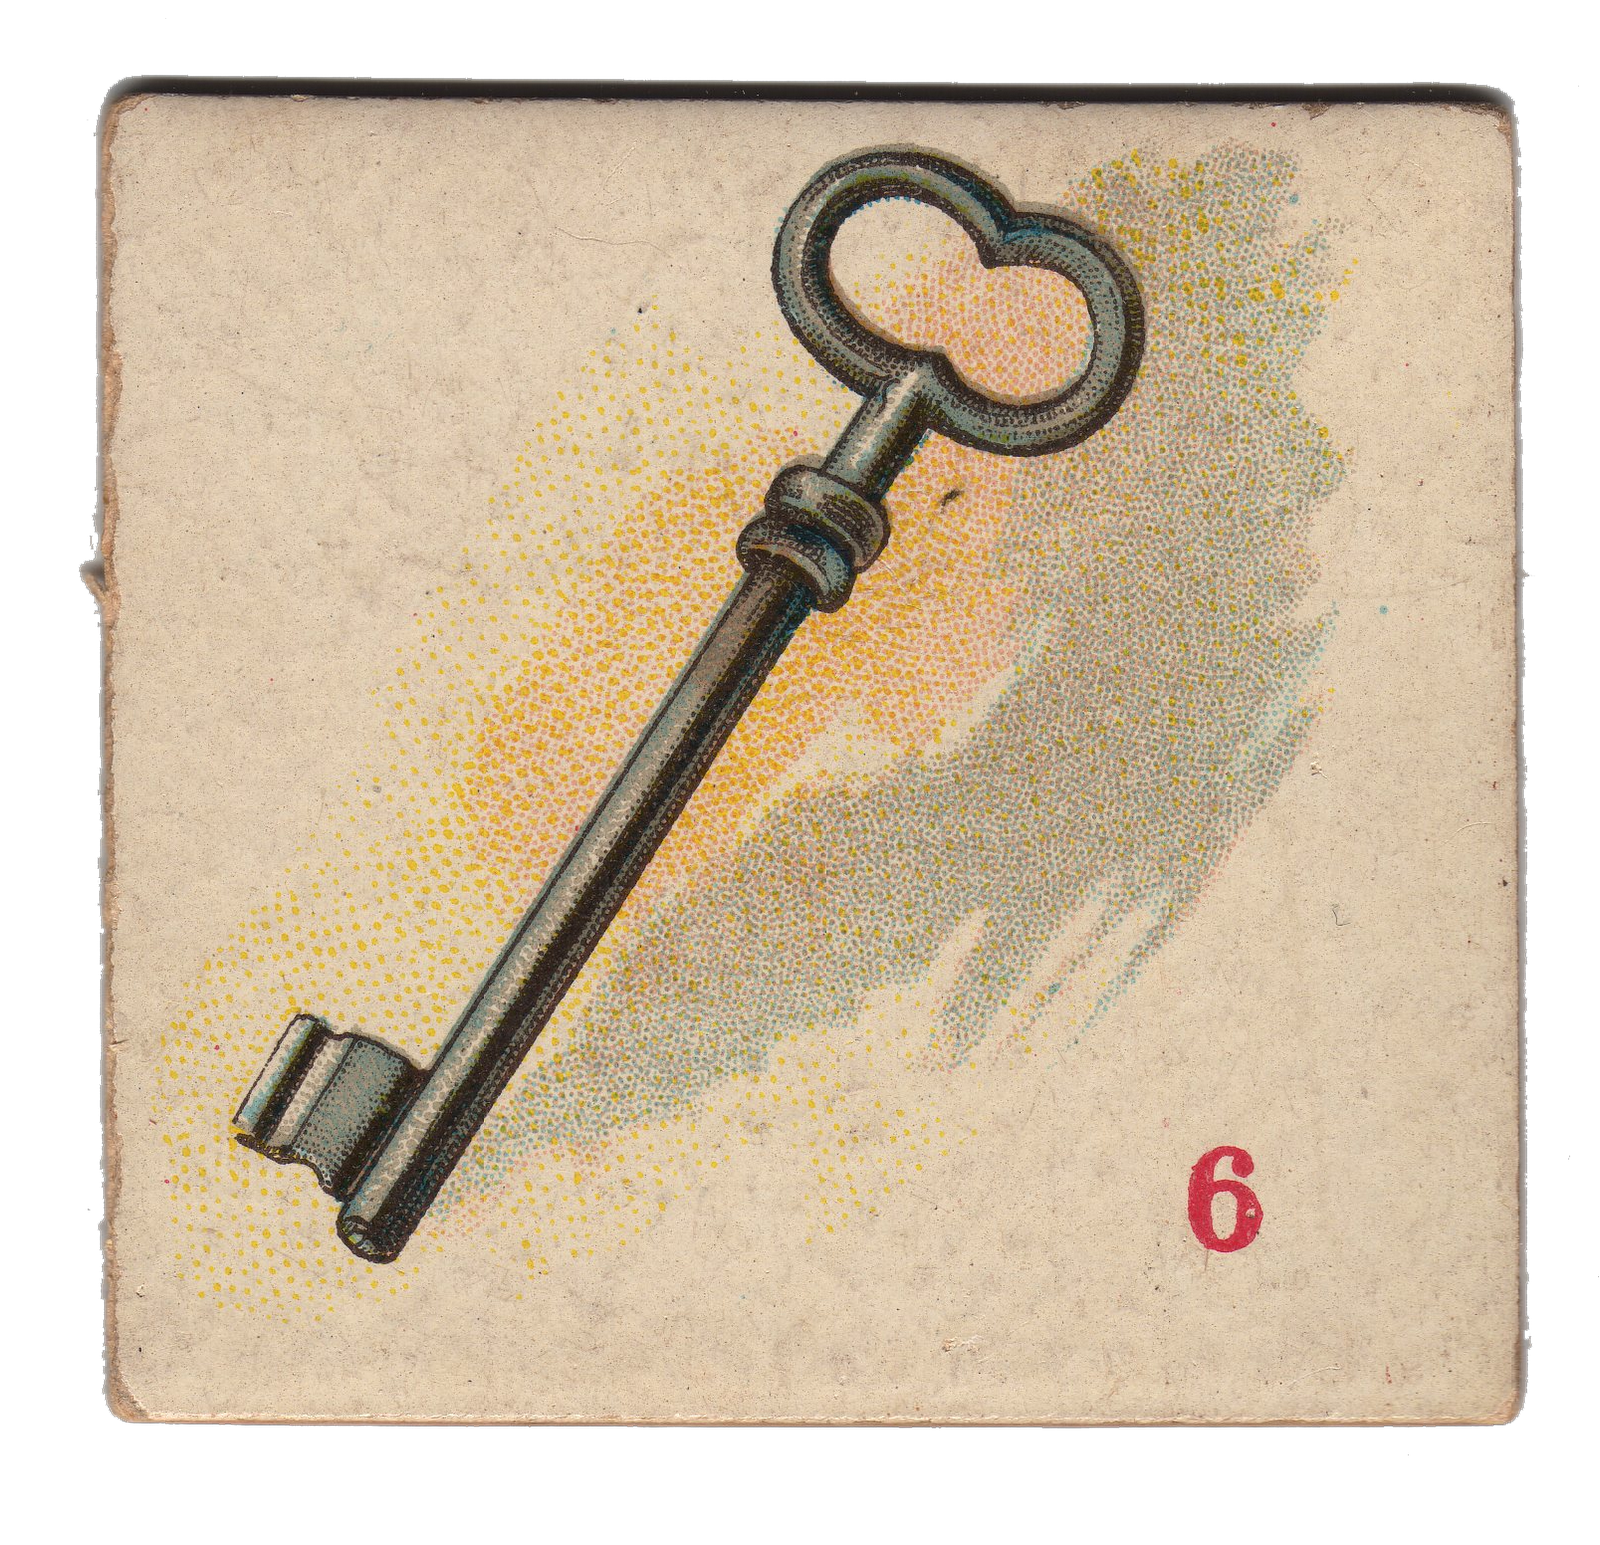 Free vintage clip art. Keys clipart medieval